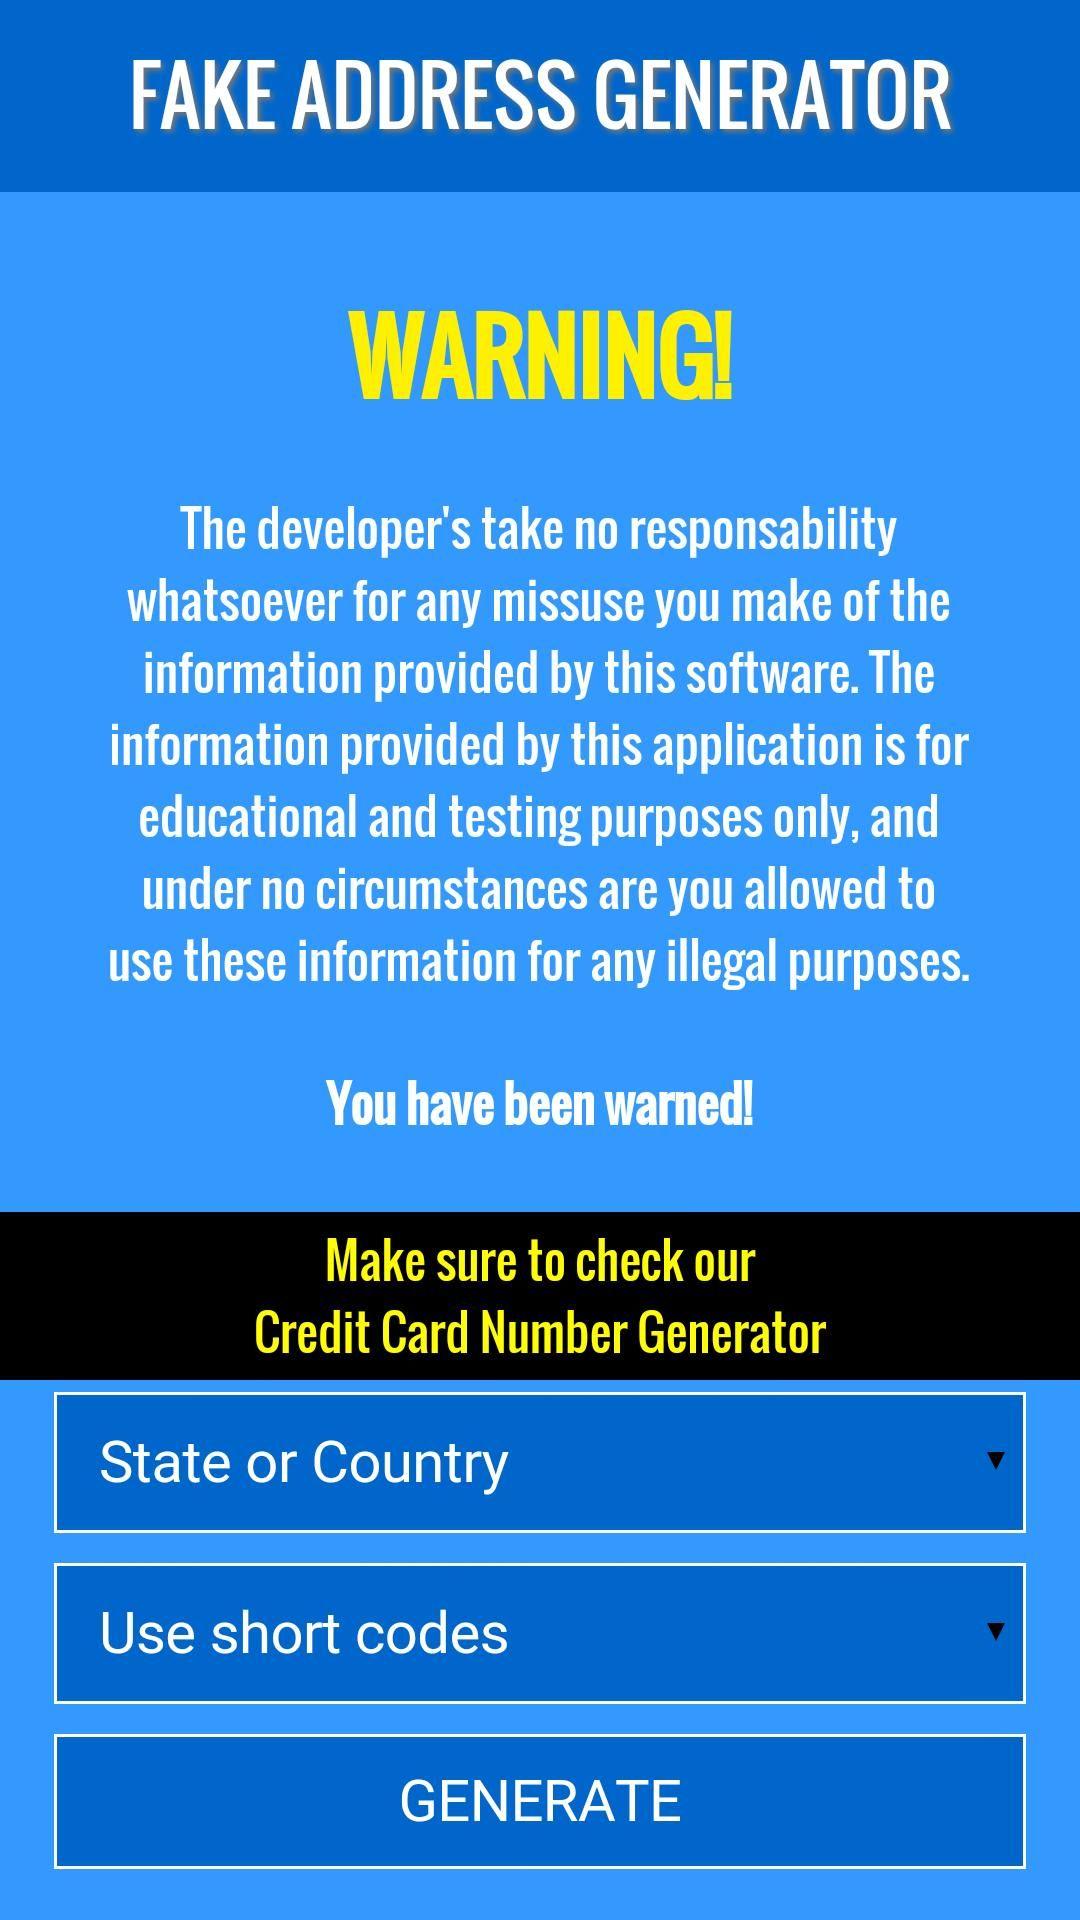 Fake Zip Code Address For Android Apk Download Visa Card Generators For Sale Coding